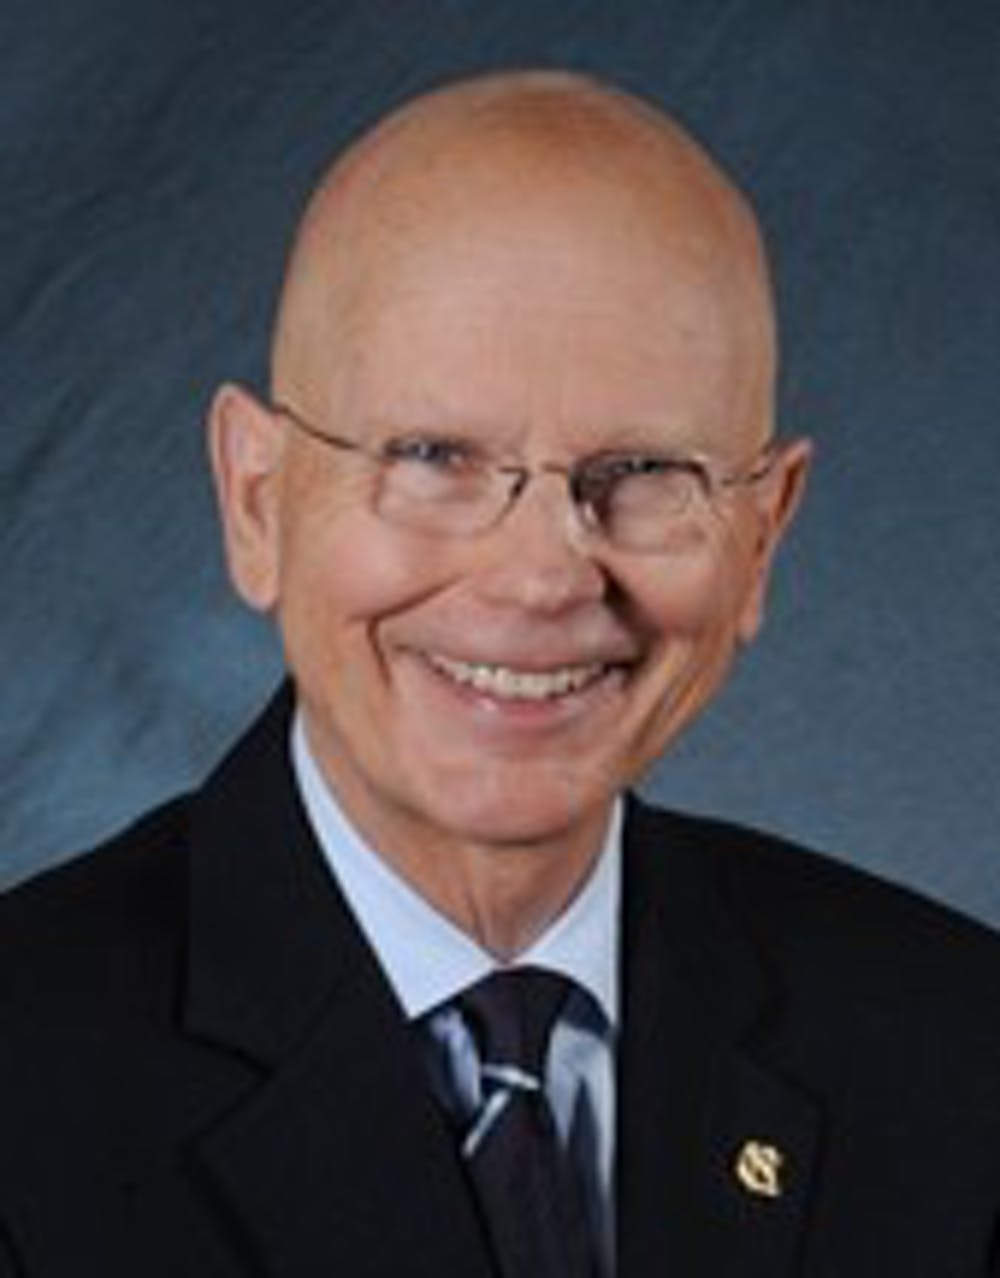 Former UNC chancellor opposes returning Silent Sam to pedestal